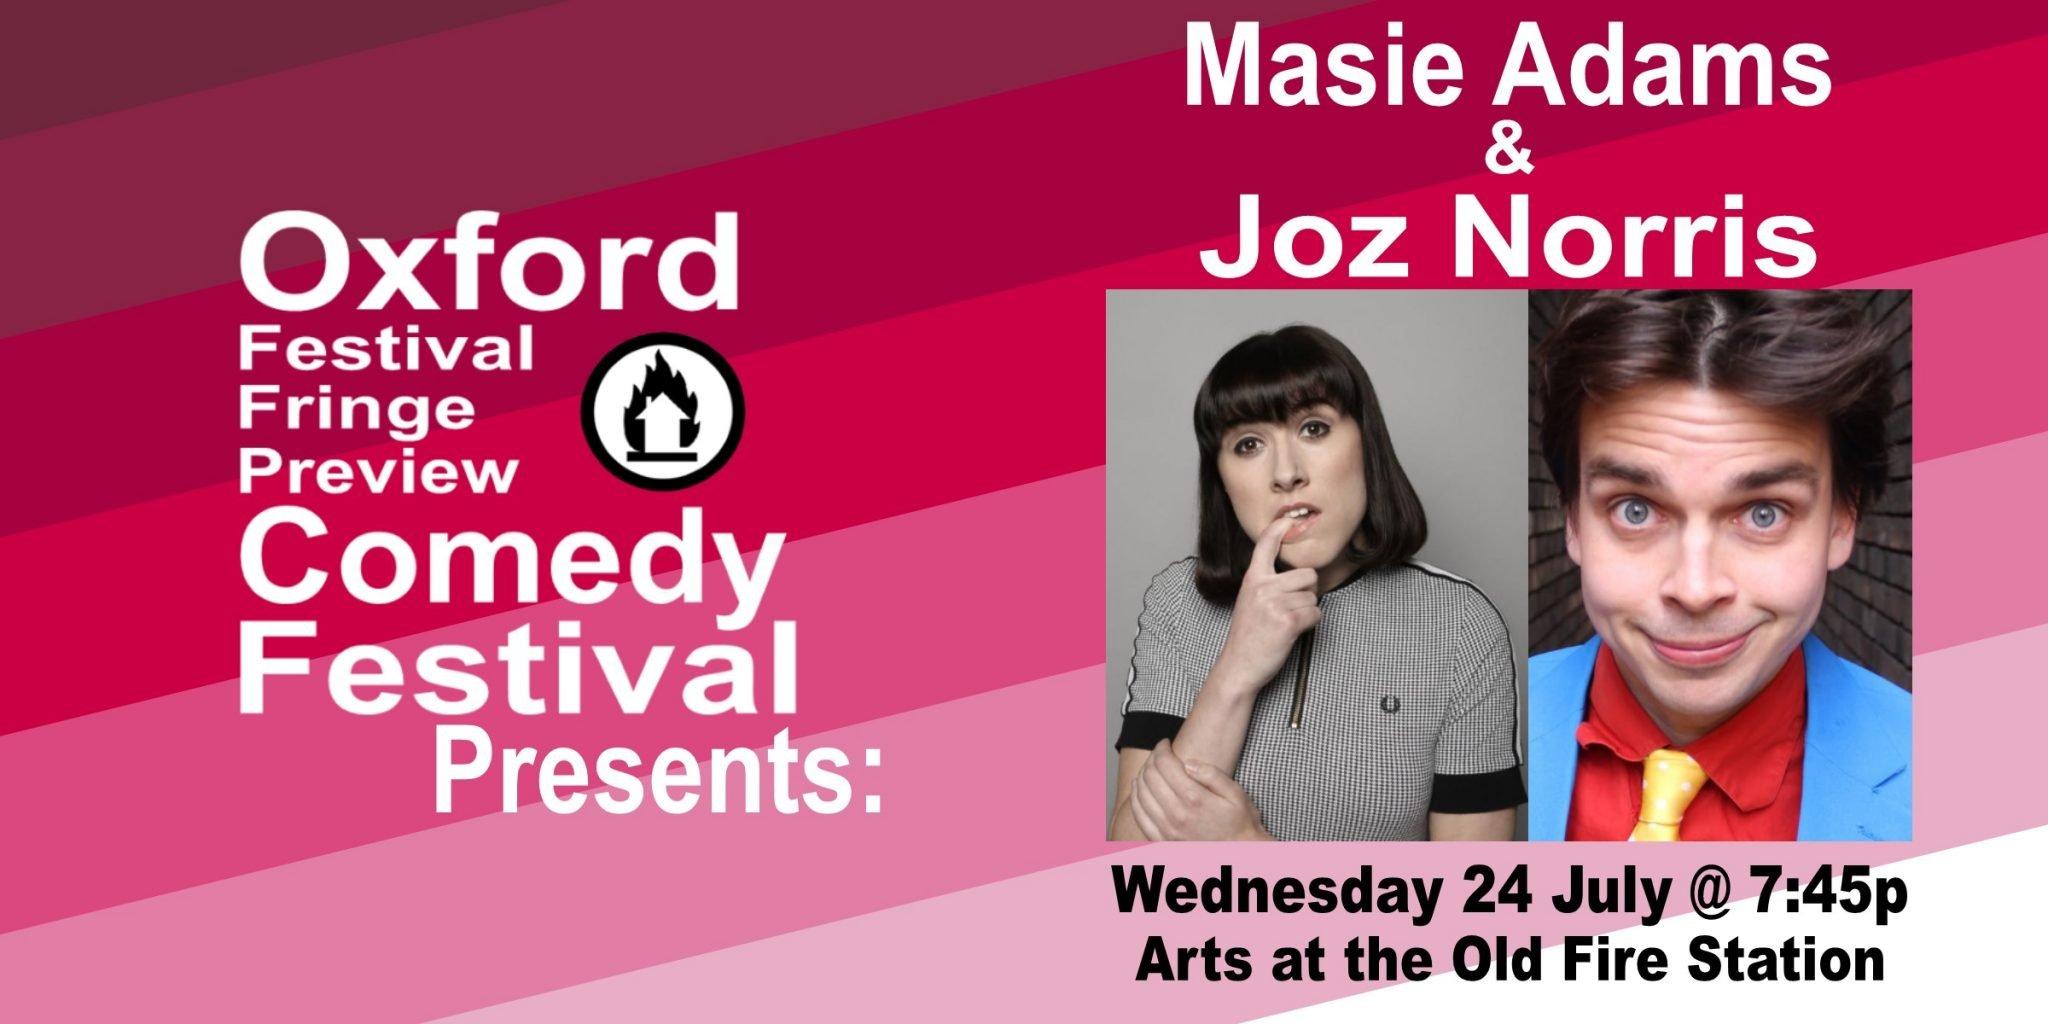 Oxford Comedy Festival 2019 presents Masie Adams & Joz Norris